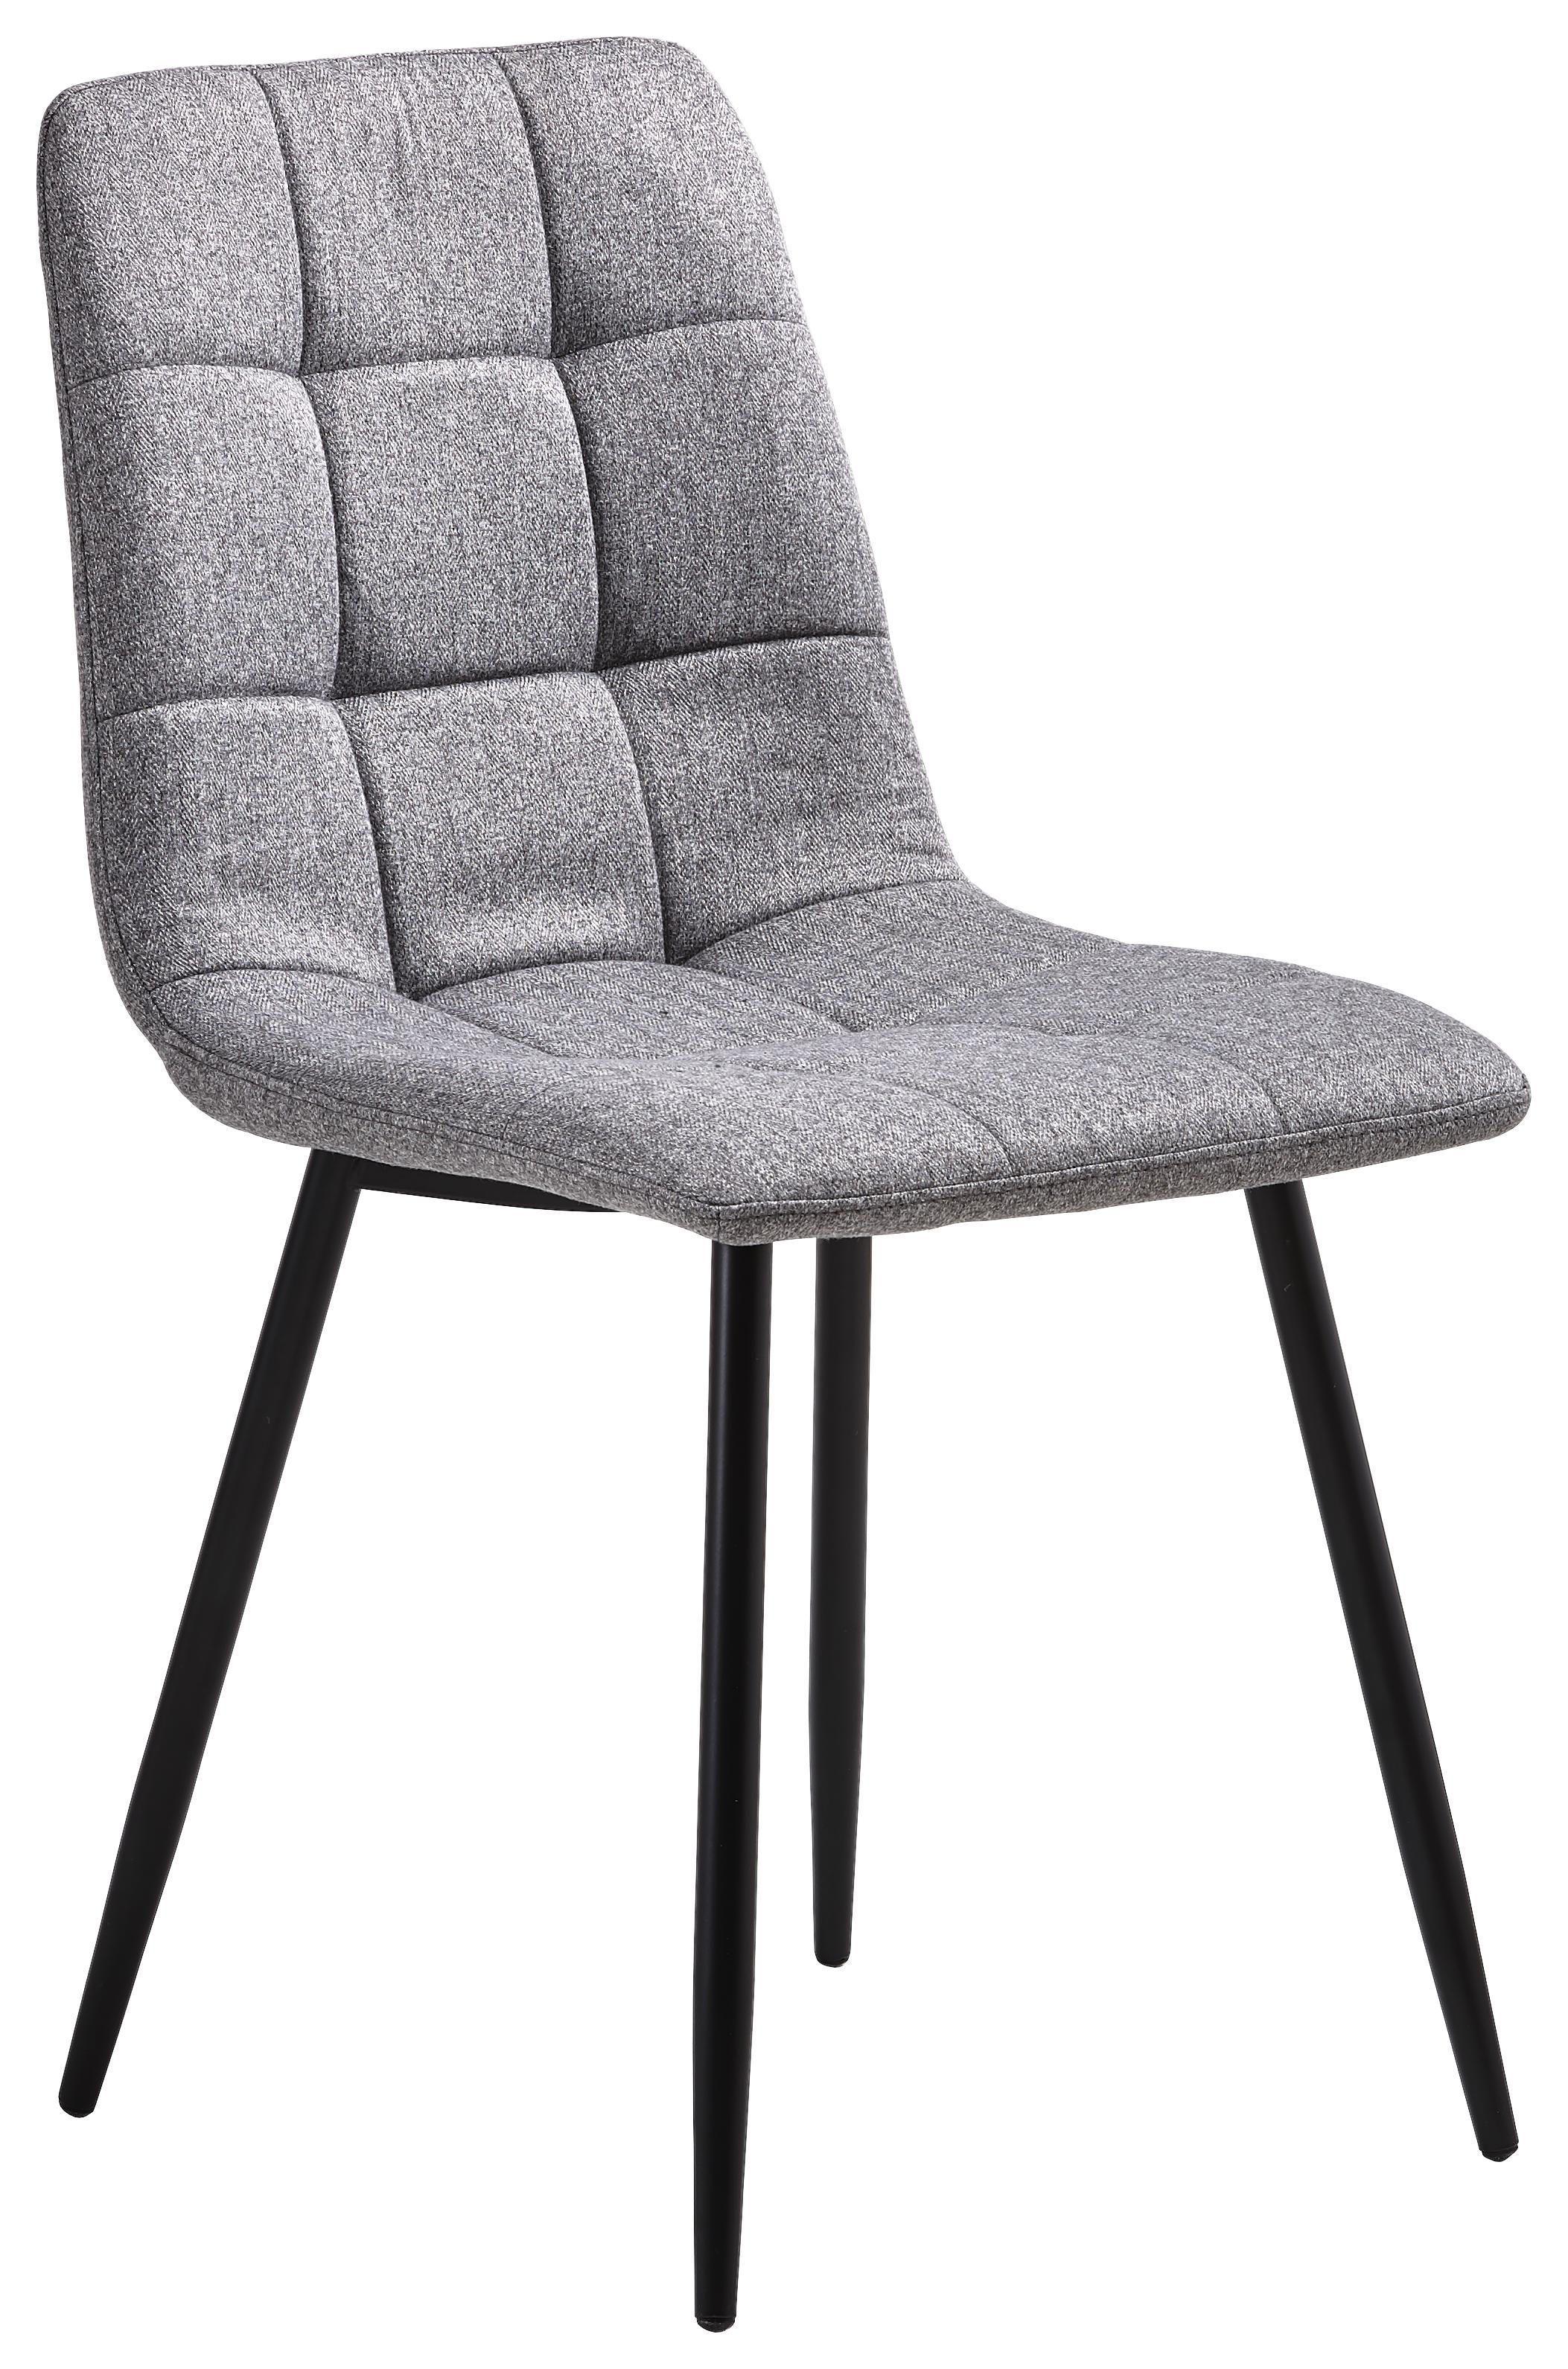 Stuhl Webstoff Grau Online Kaufen Xxxlutz In 2020 Stuhle Wol